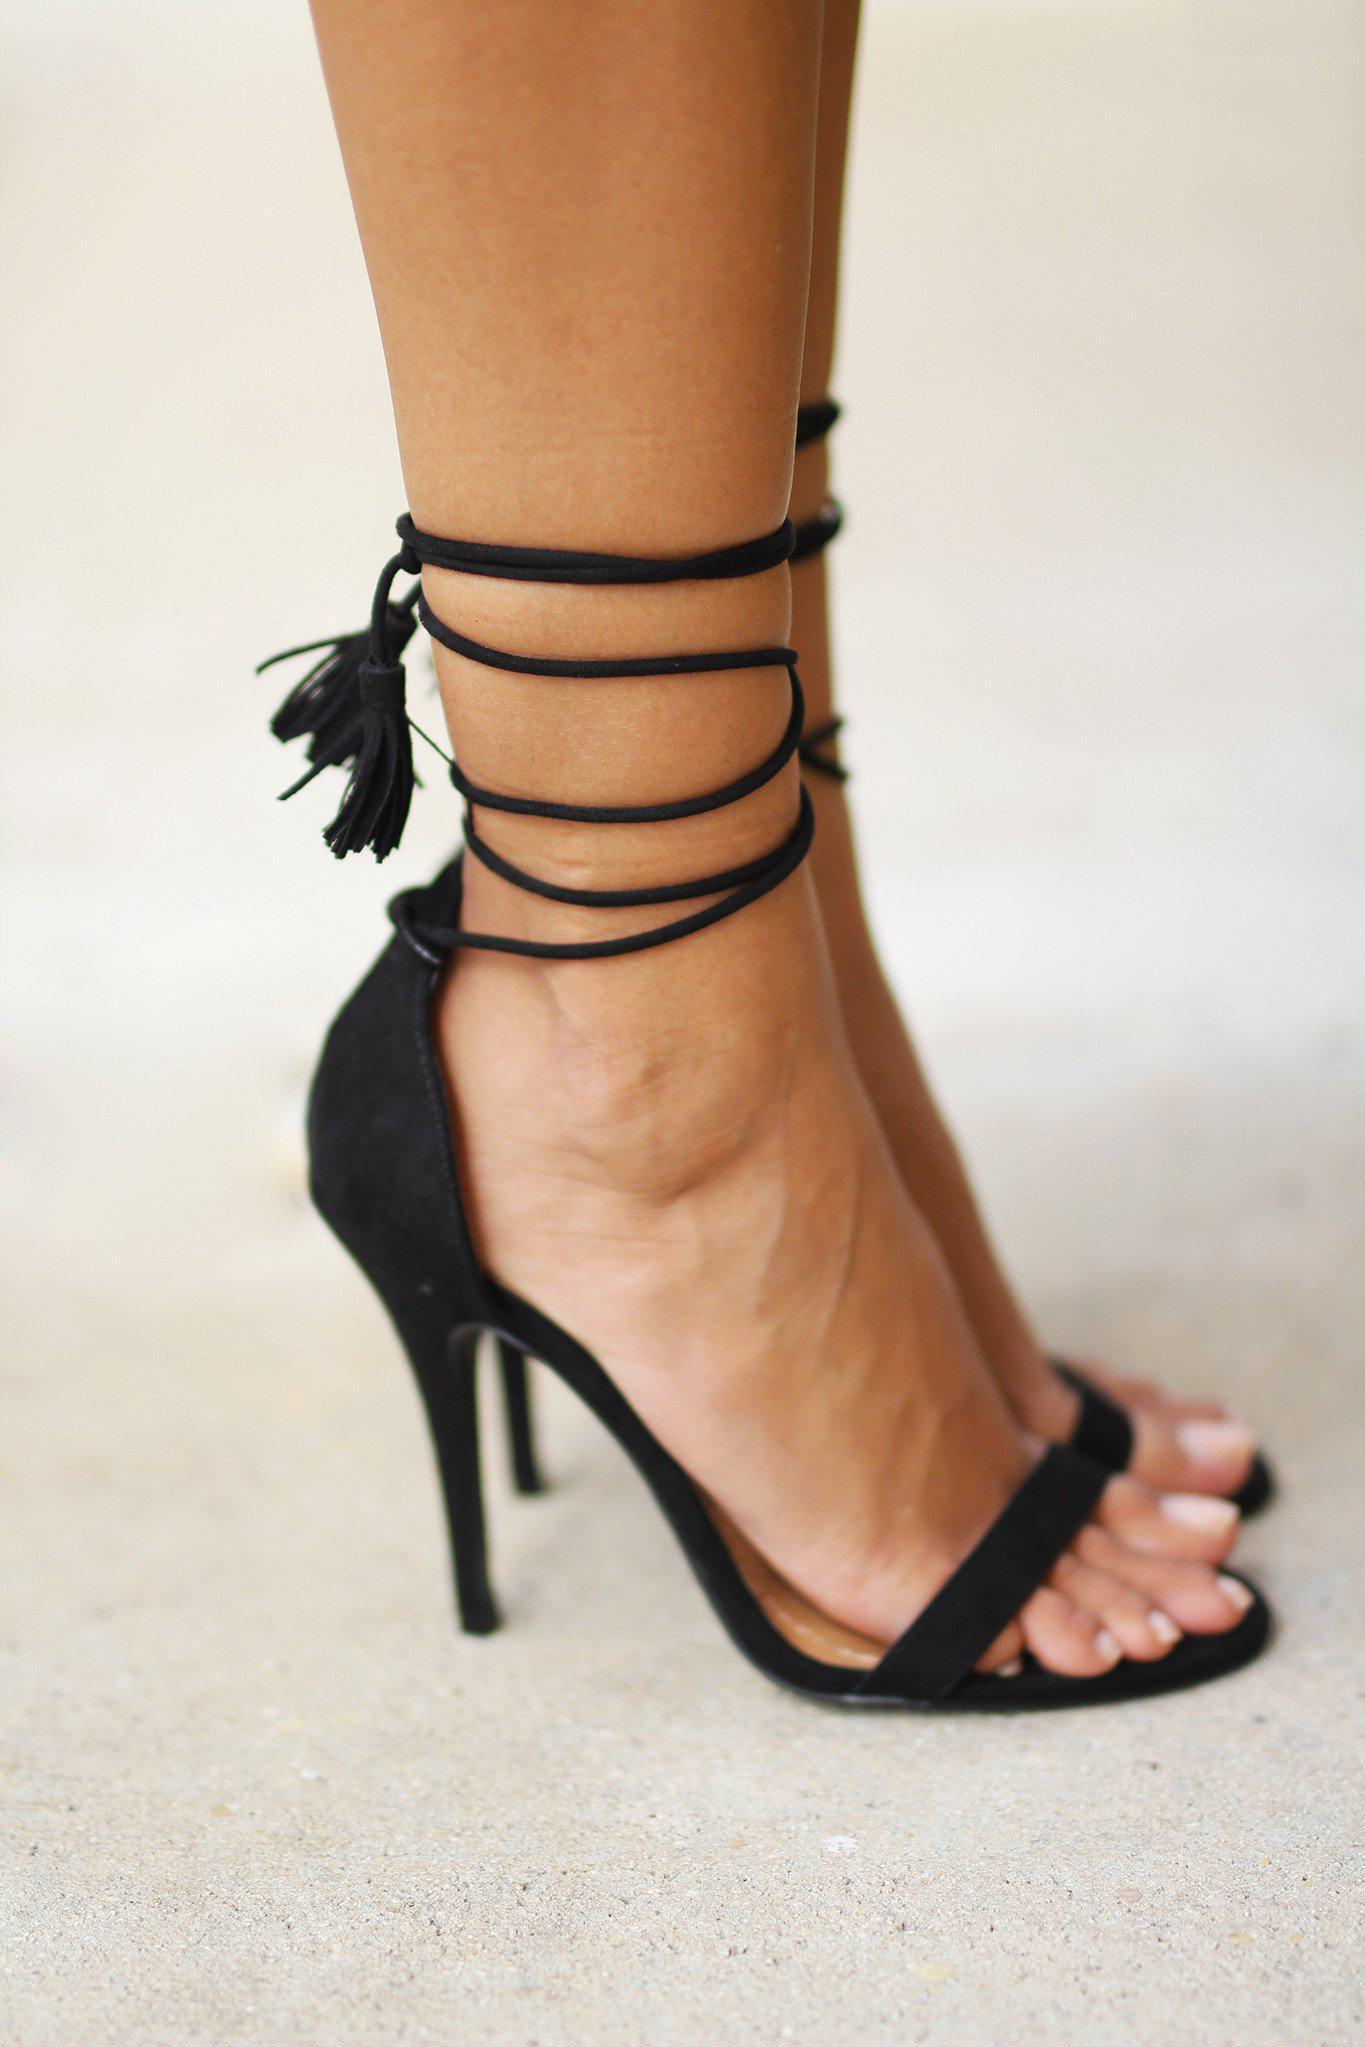 Tassel Black Lace Up Heels- $31